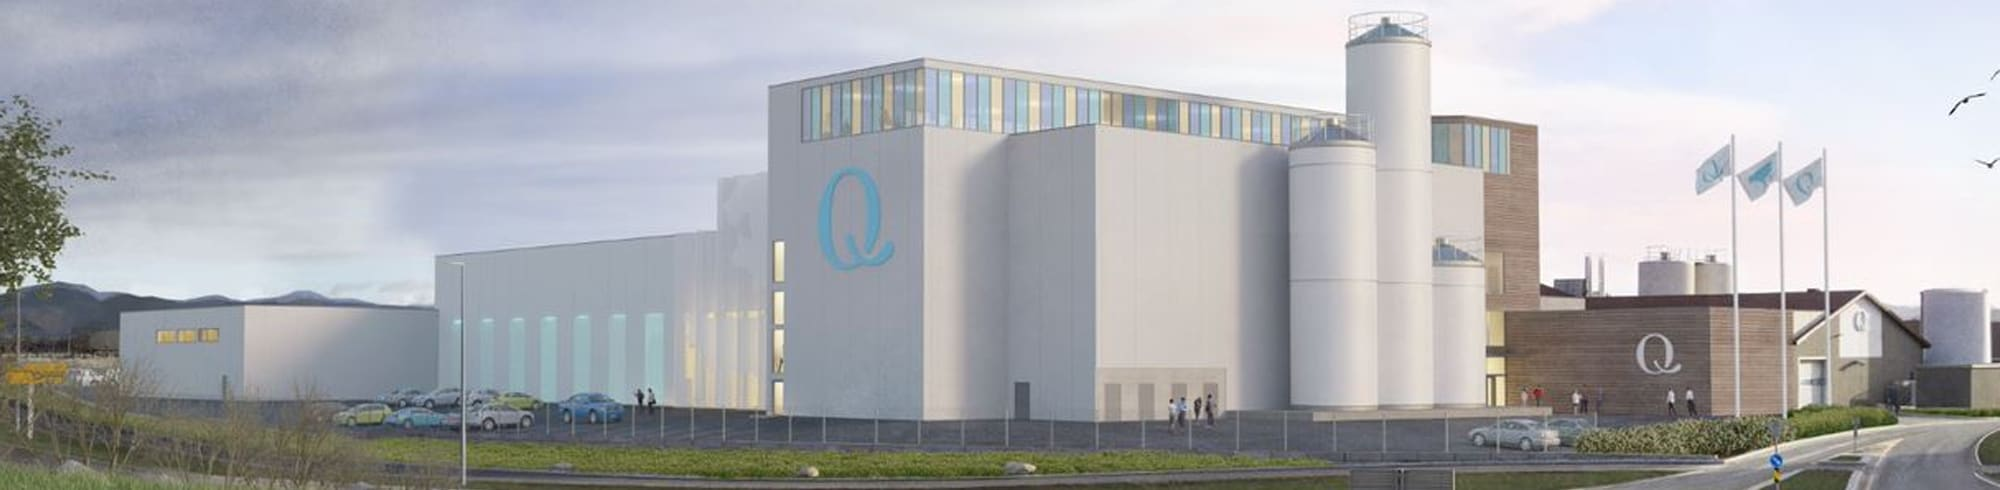 Q-Meieriet